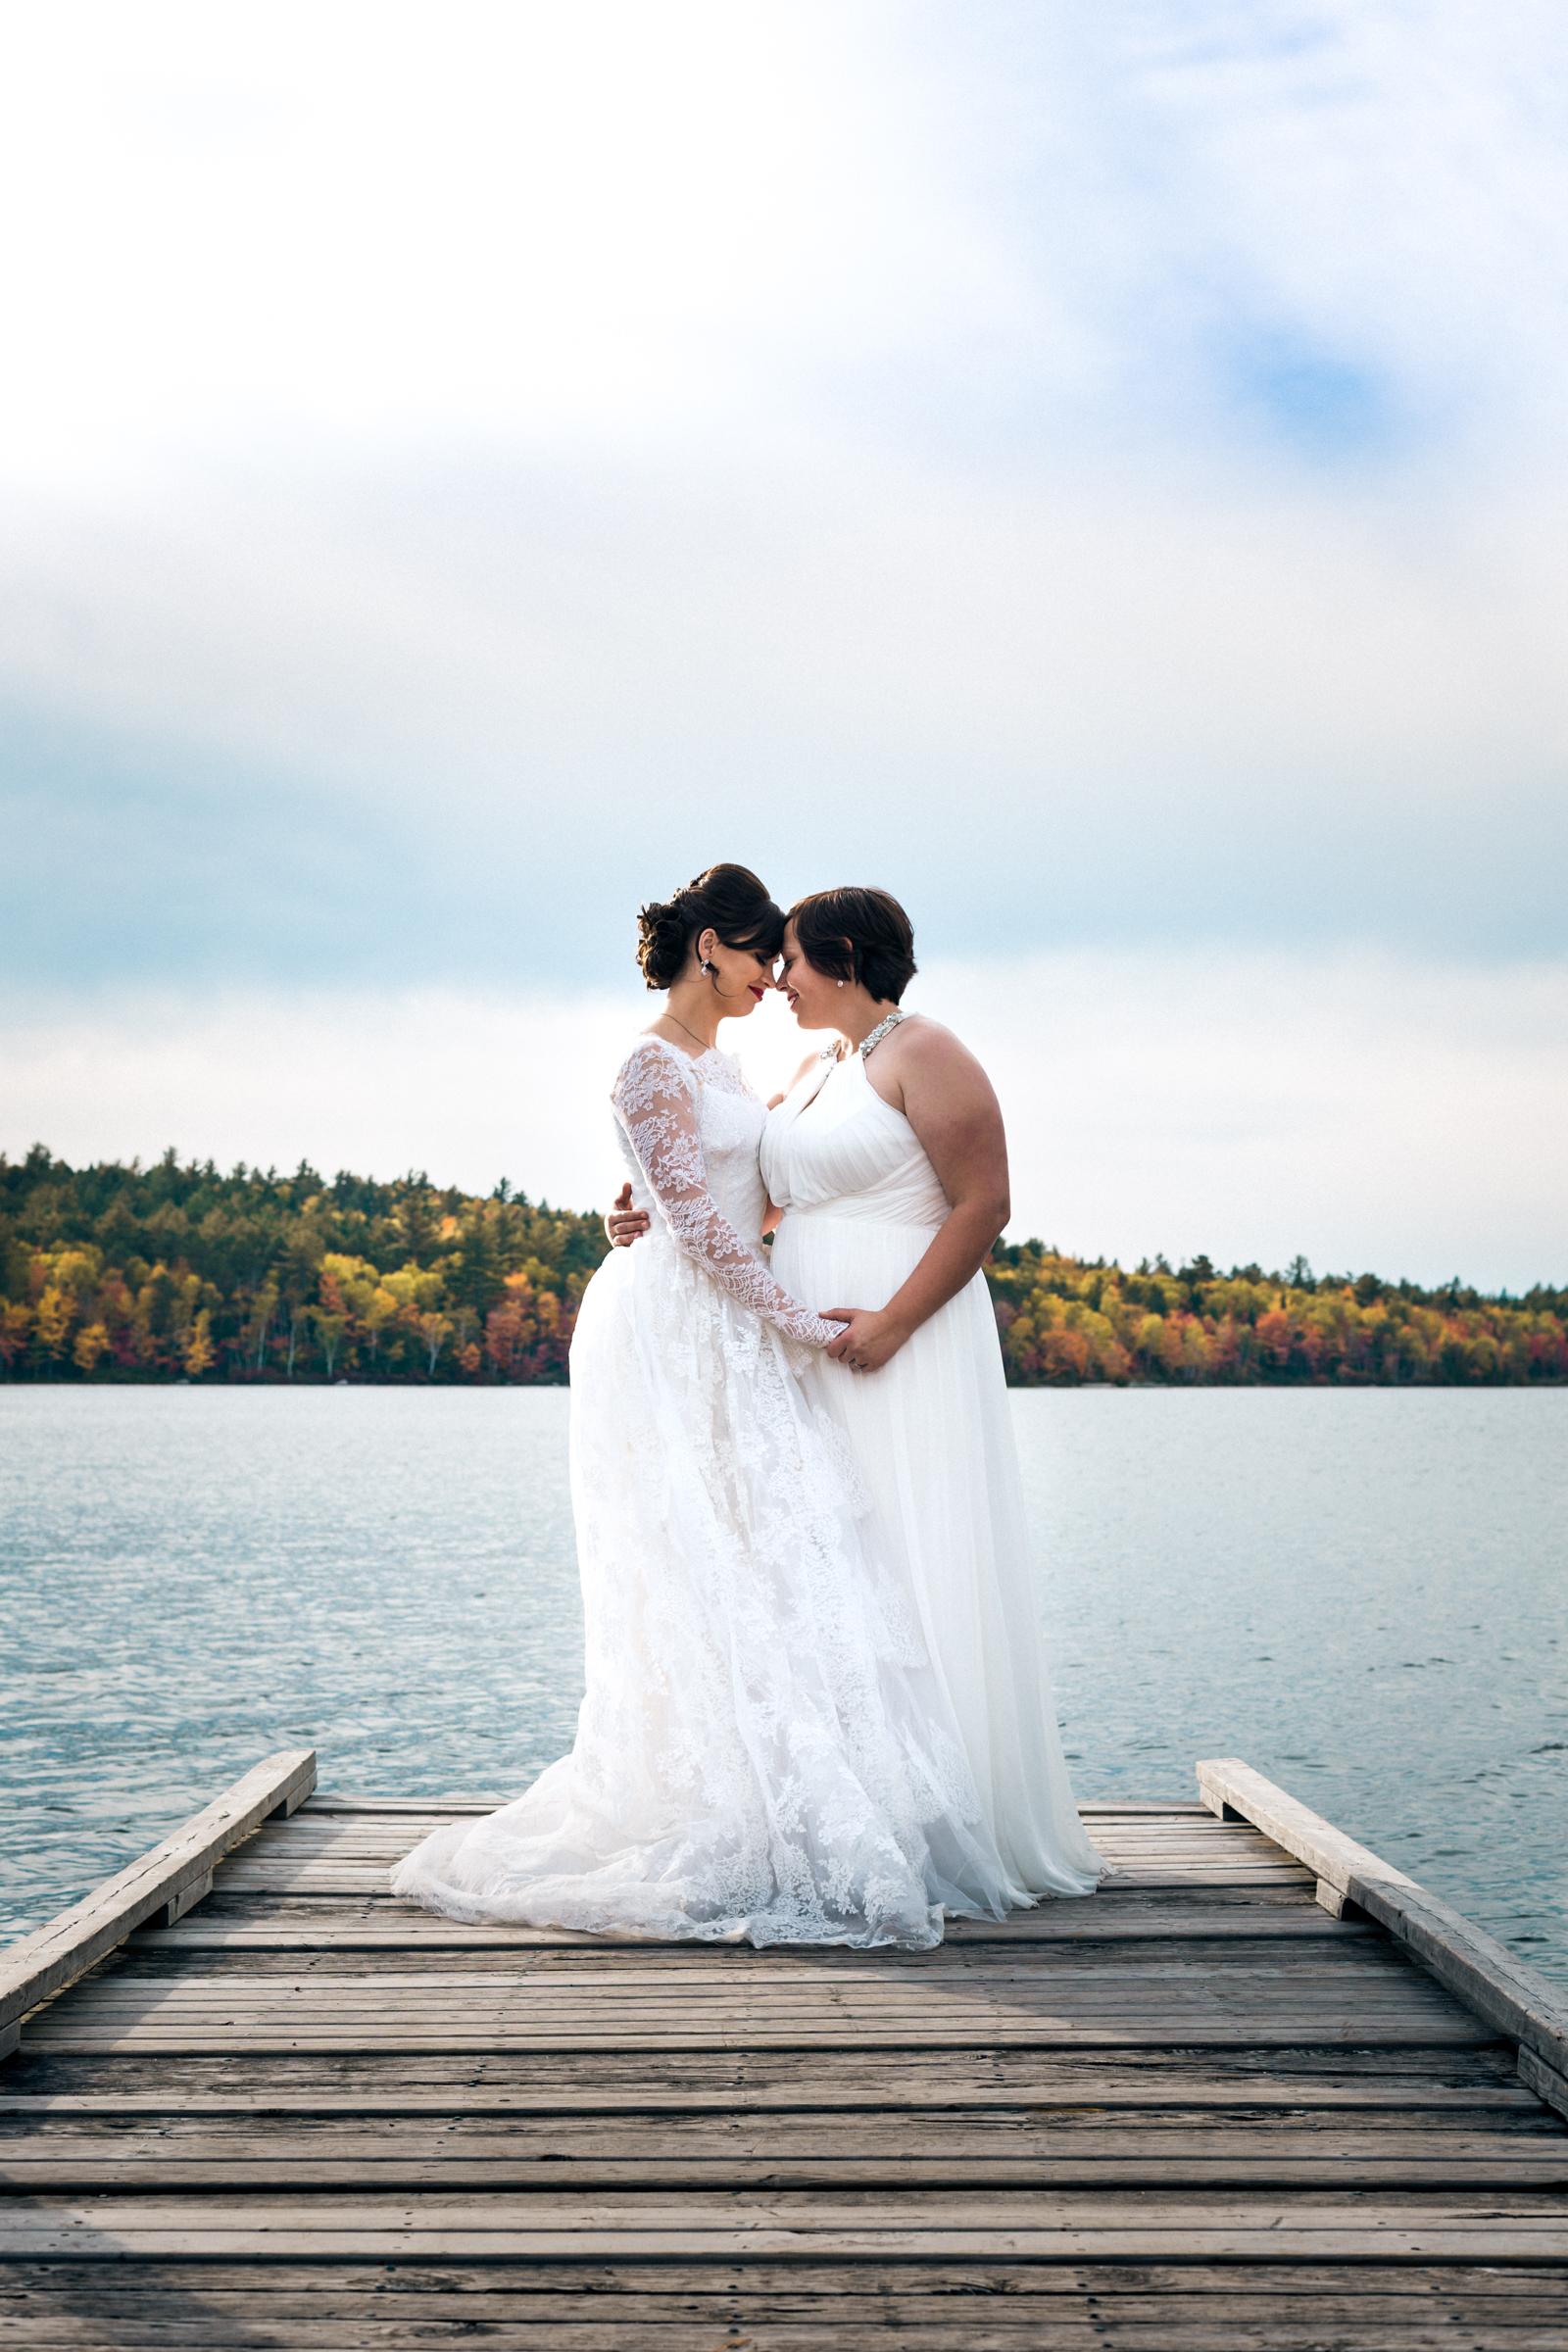 201610_k&c_wedding_2250.jpg